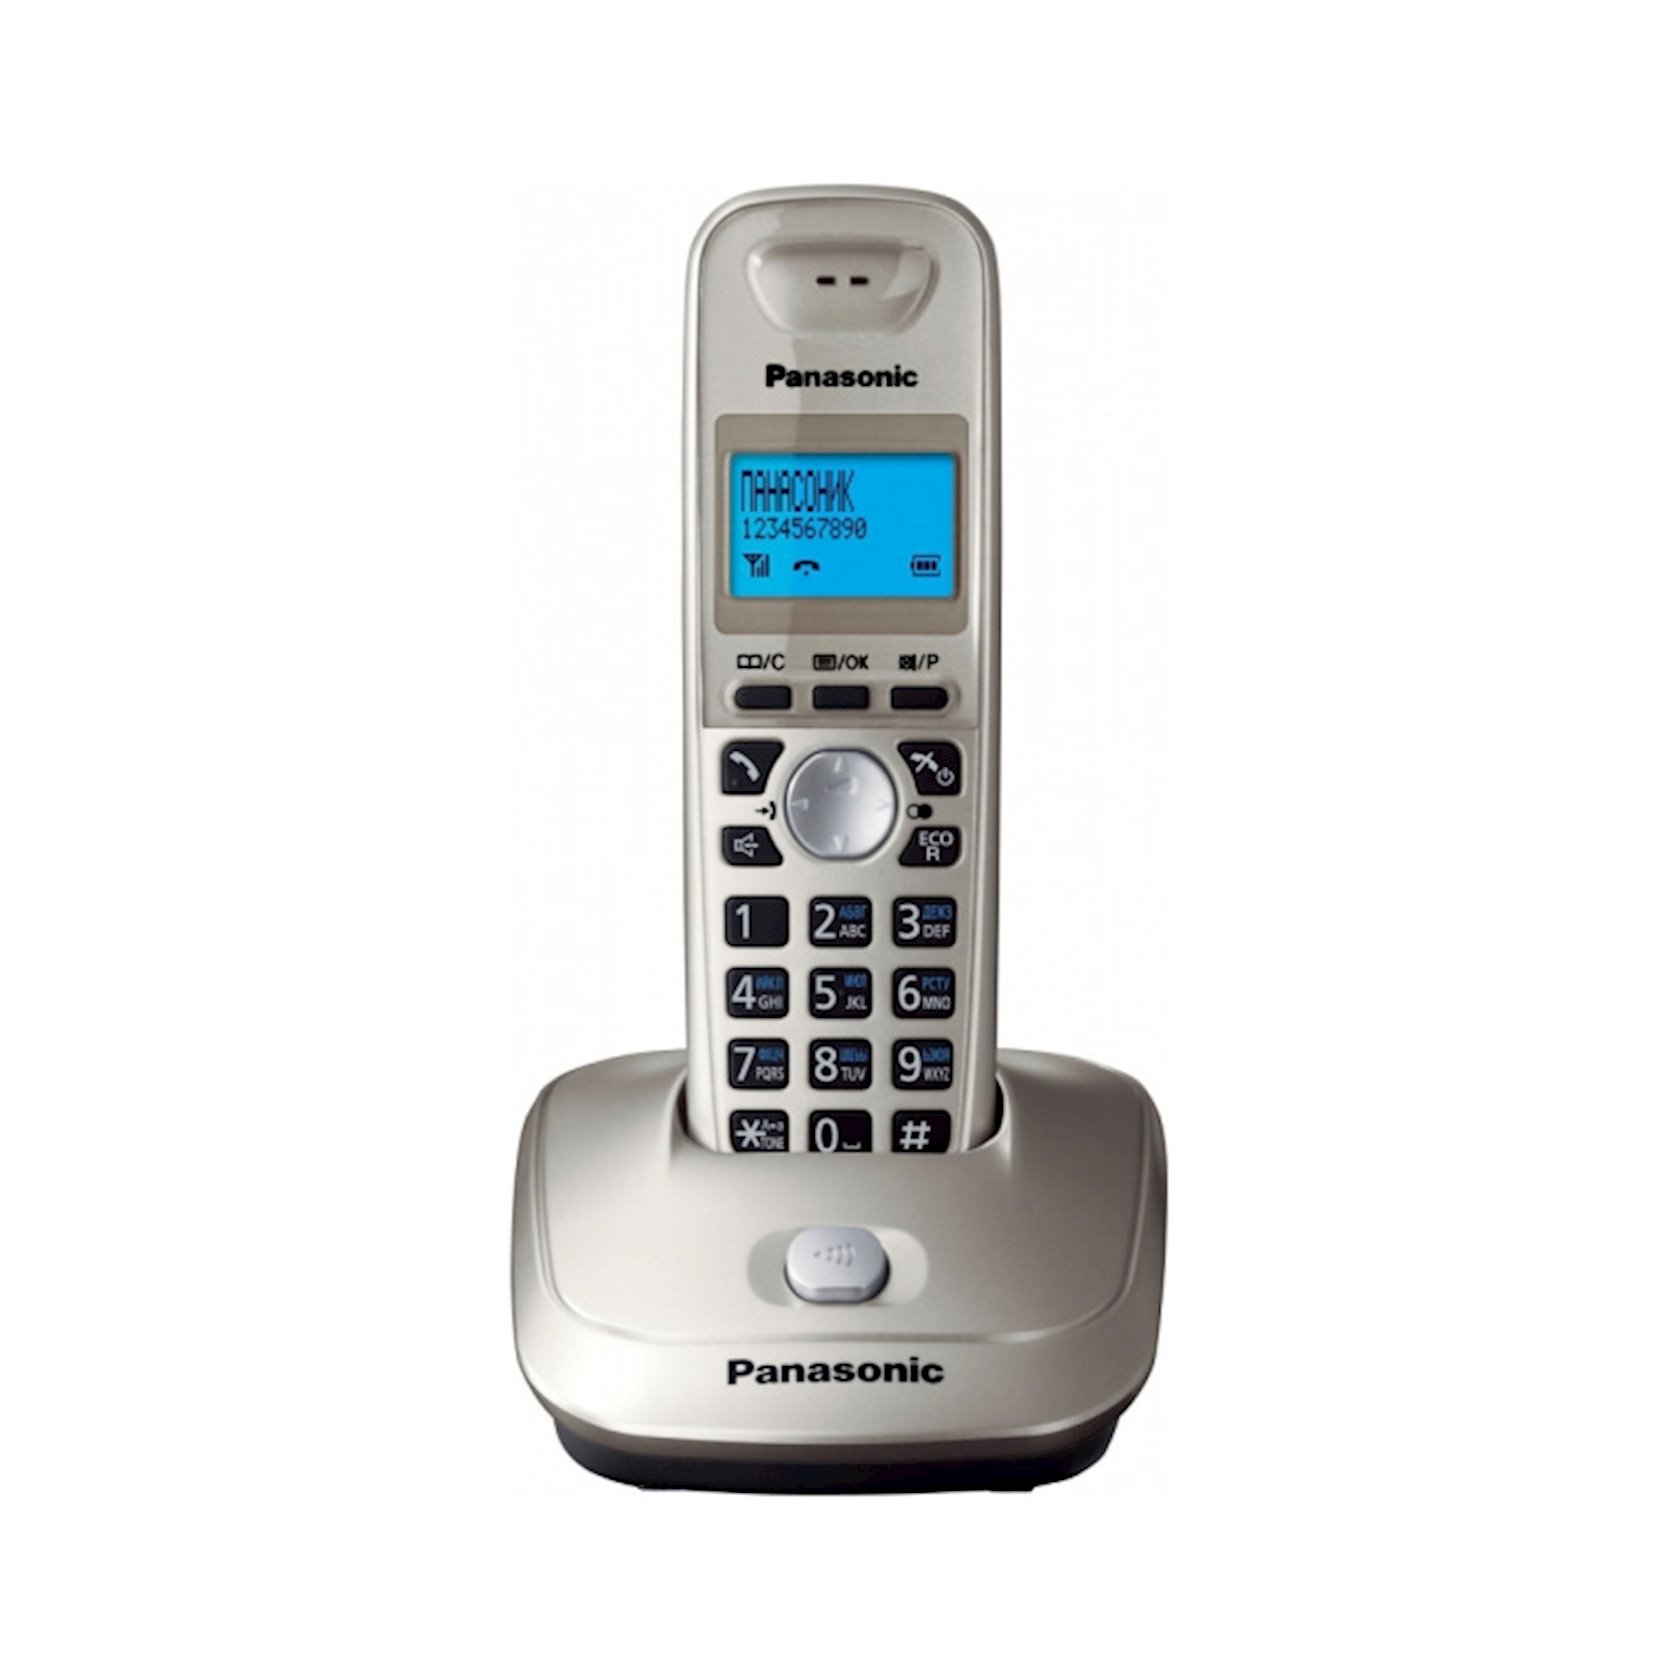 Radiotelefon Panasonic KX-TG2511UAN Platinum